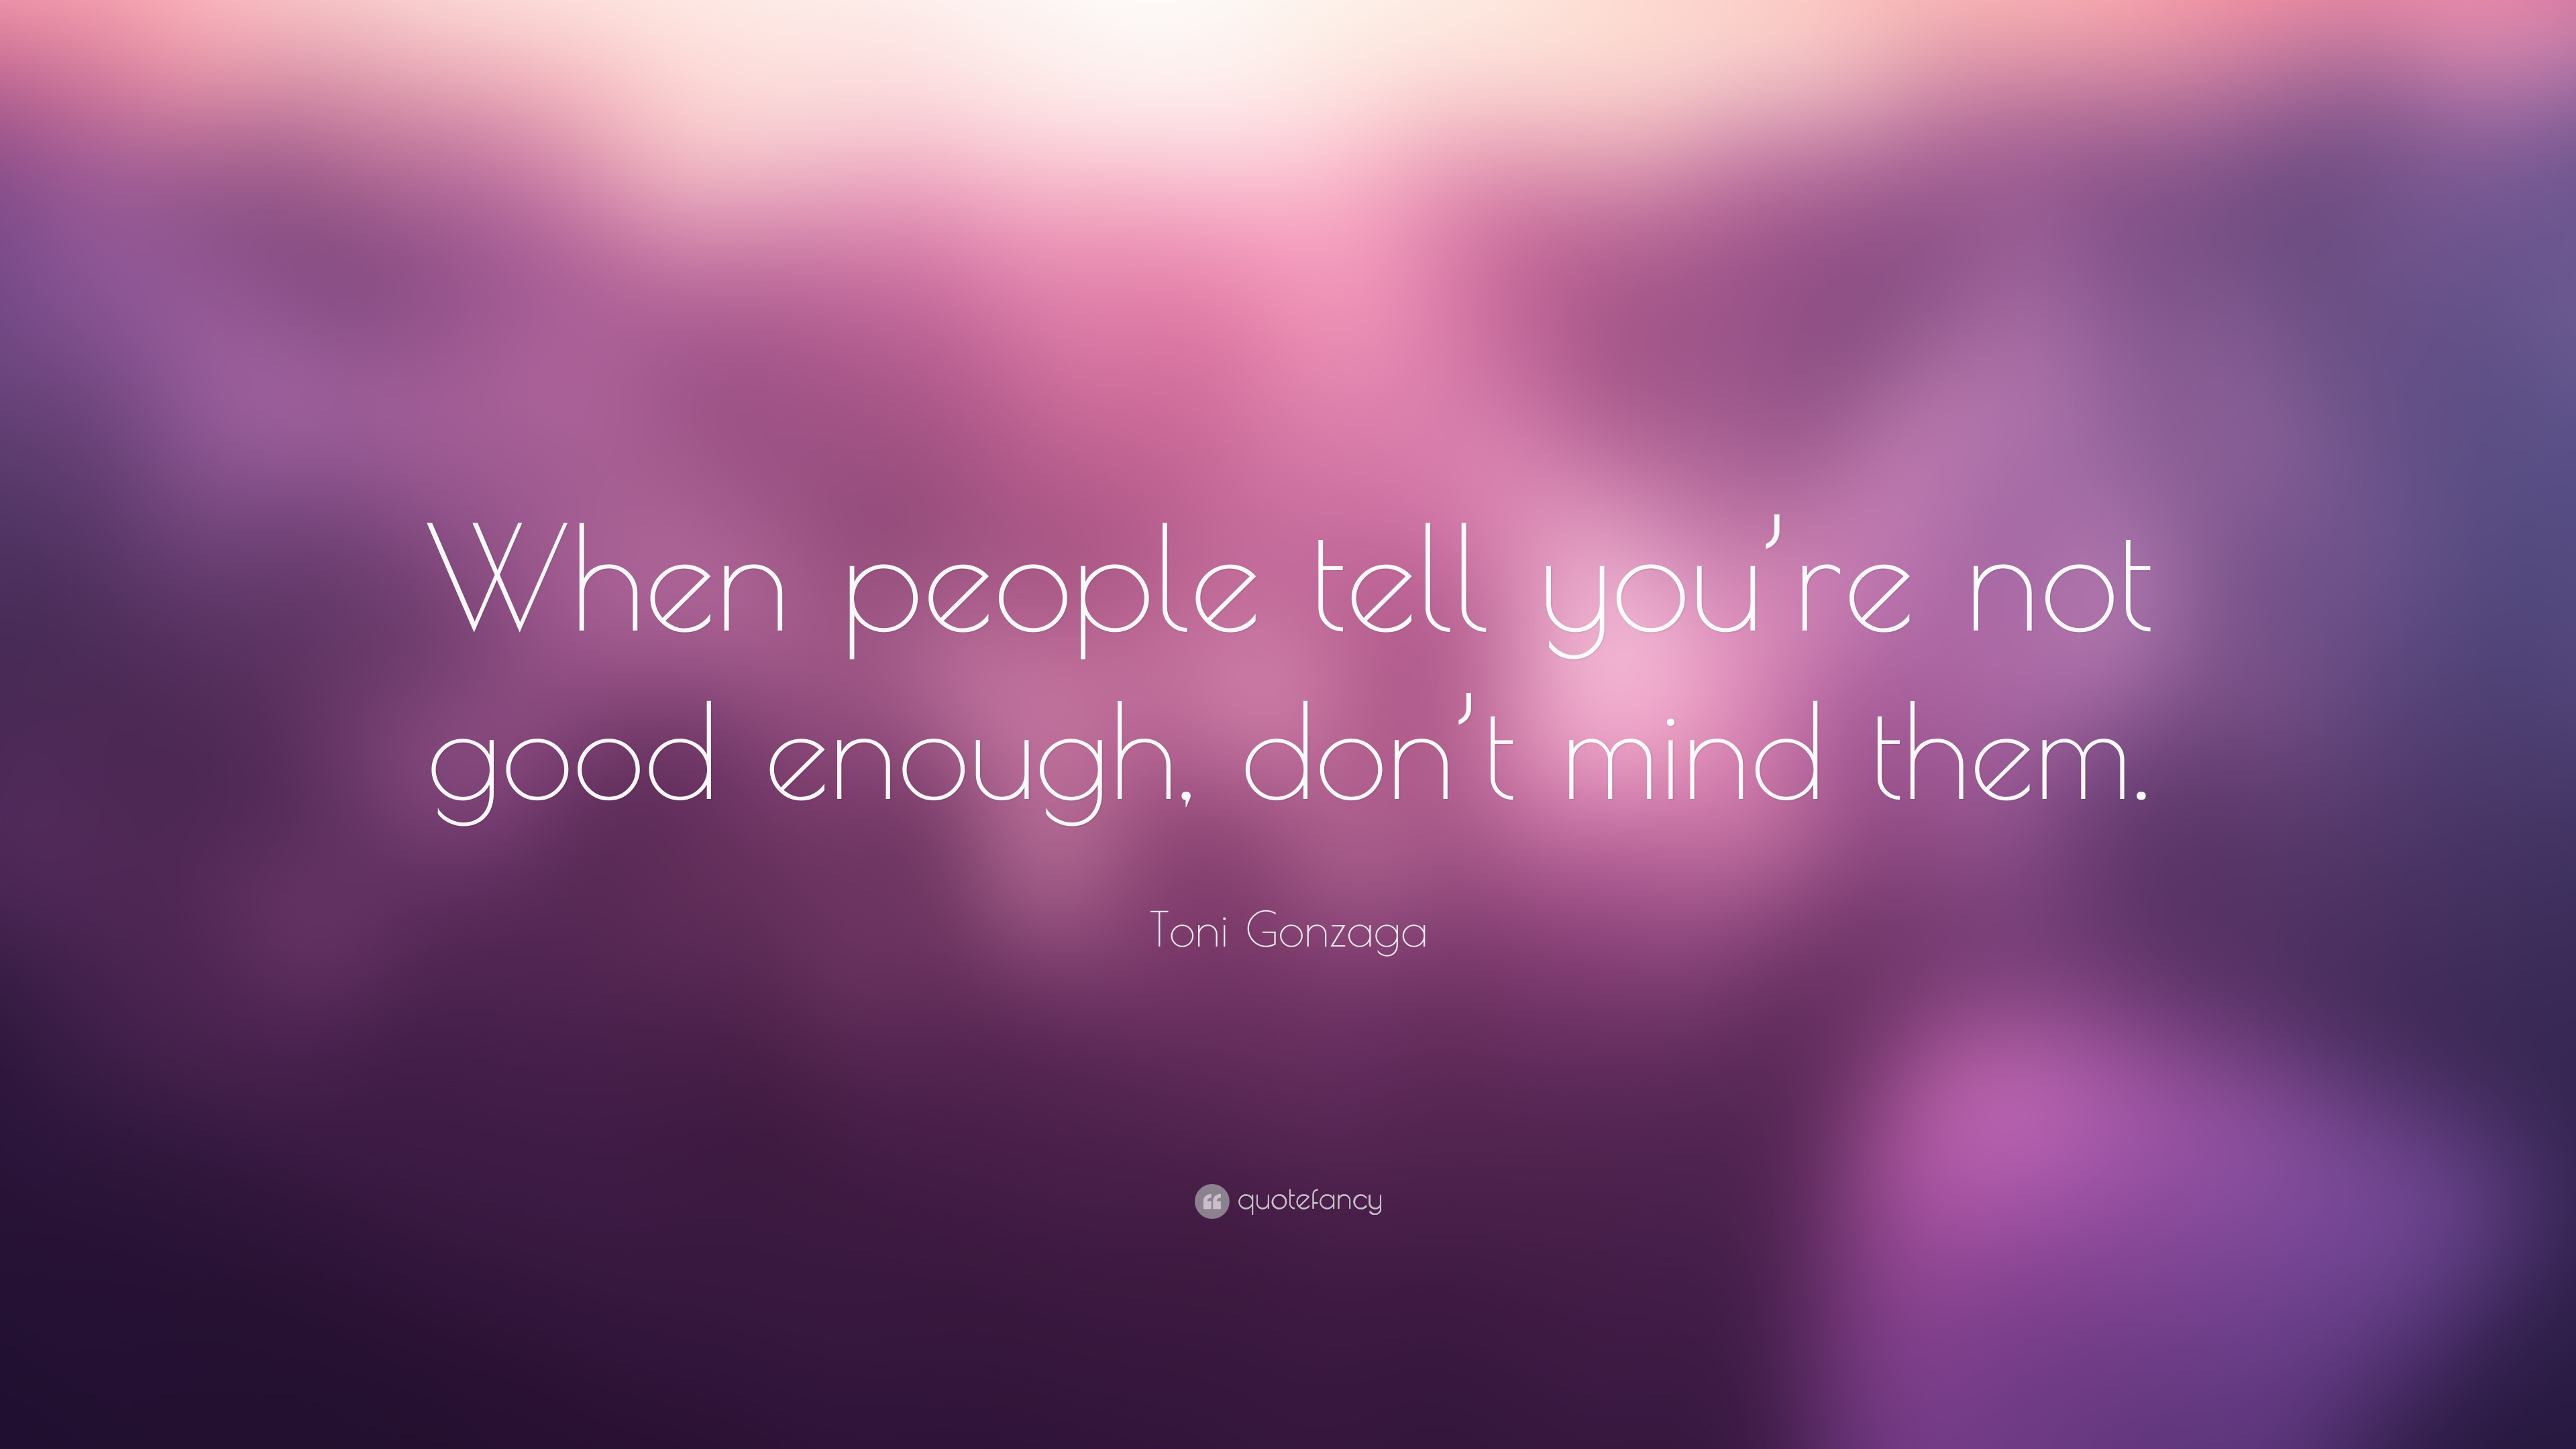 Toni Gonzaga Quotes 13 Wallpapers Quotefancy